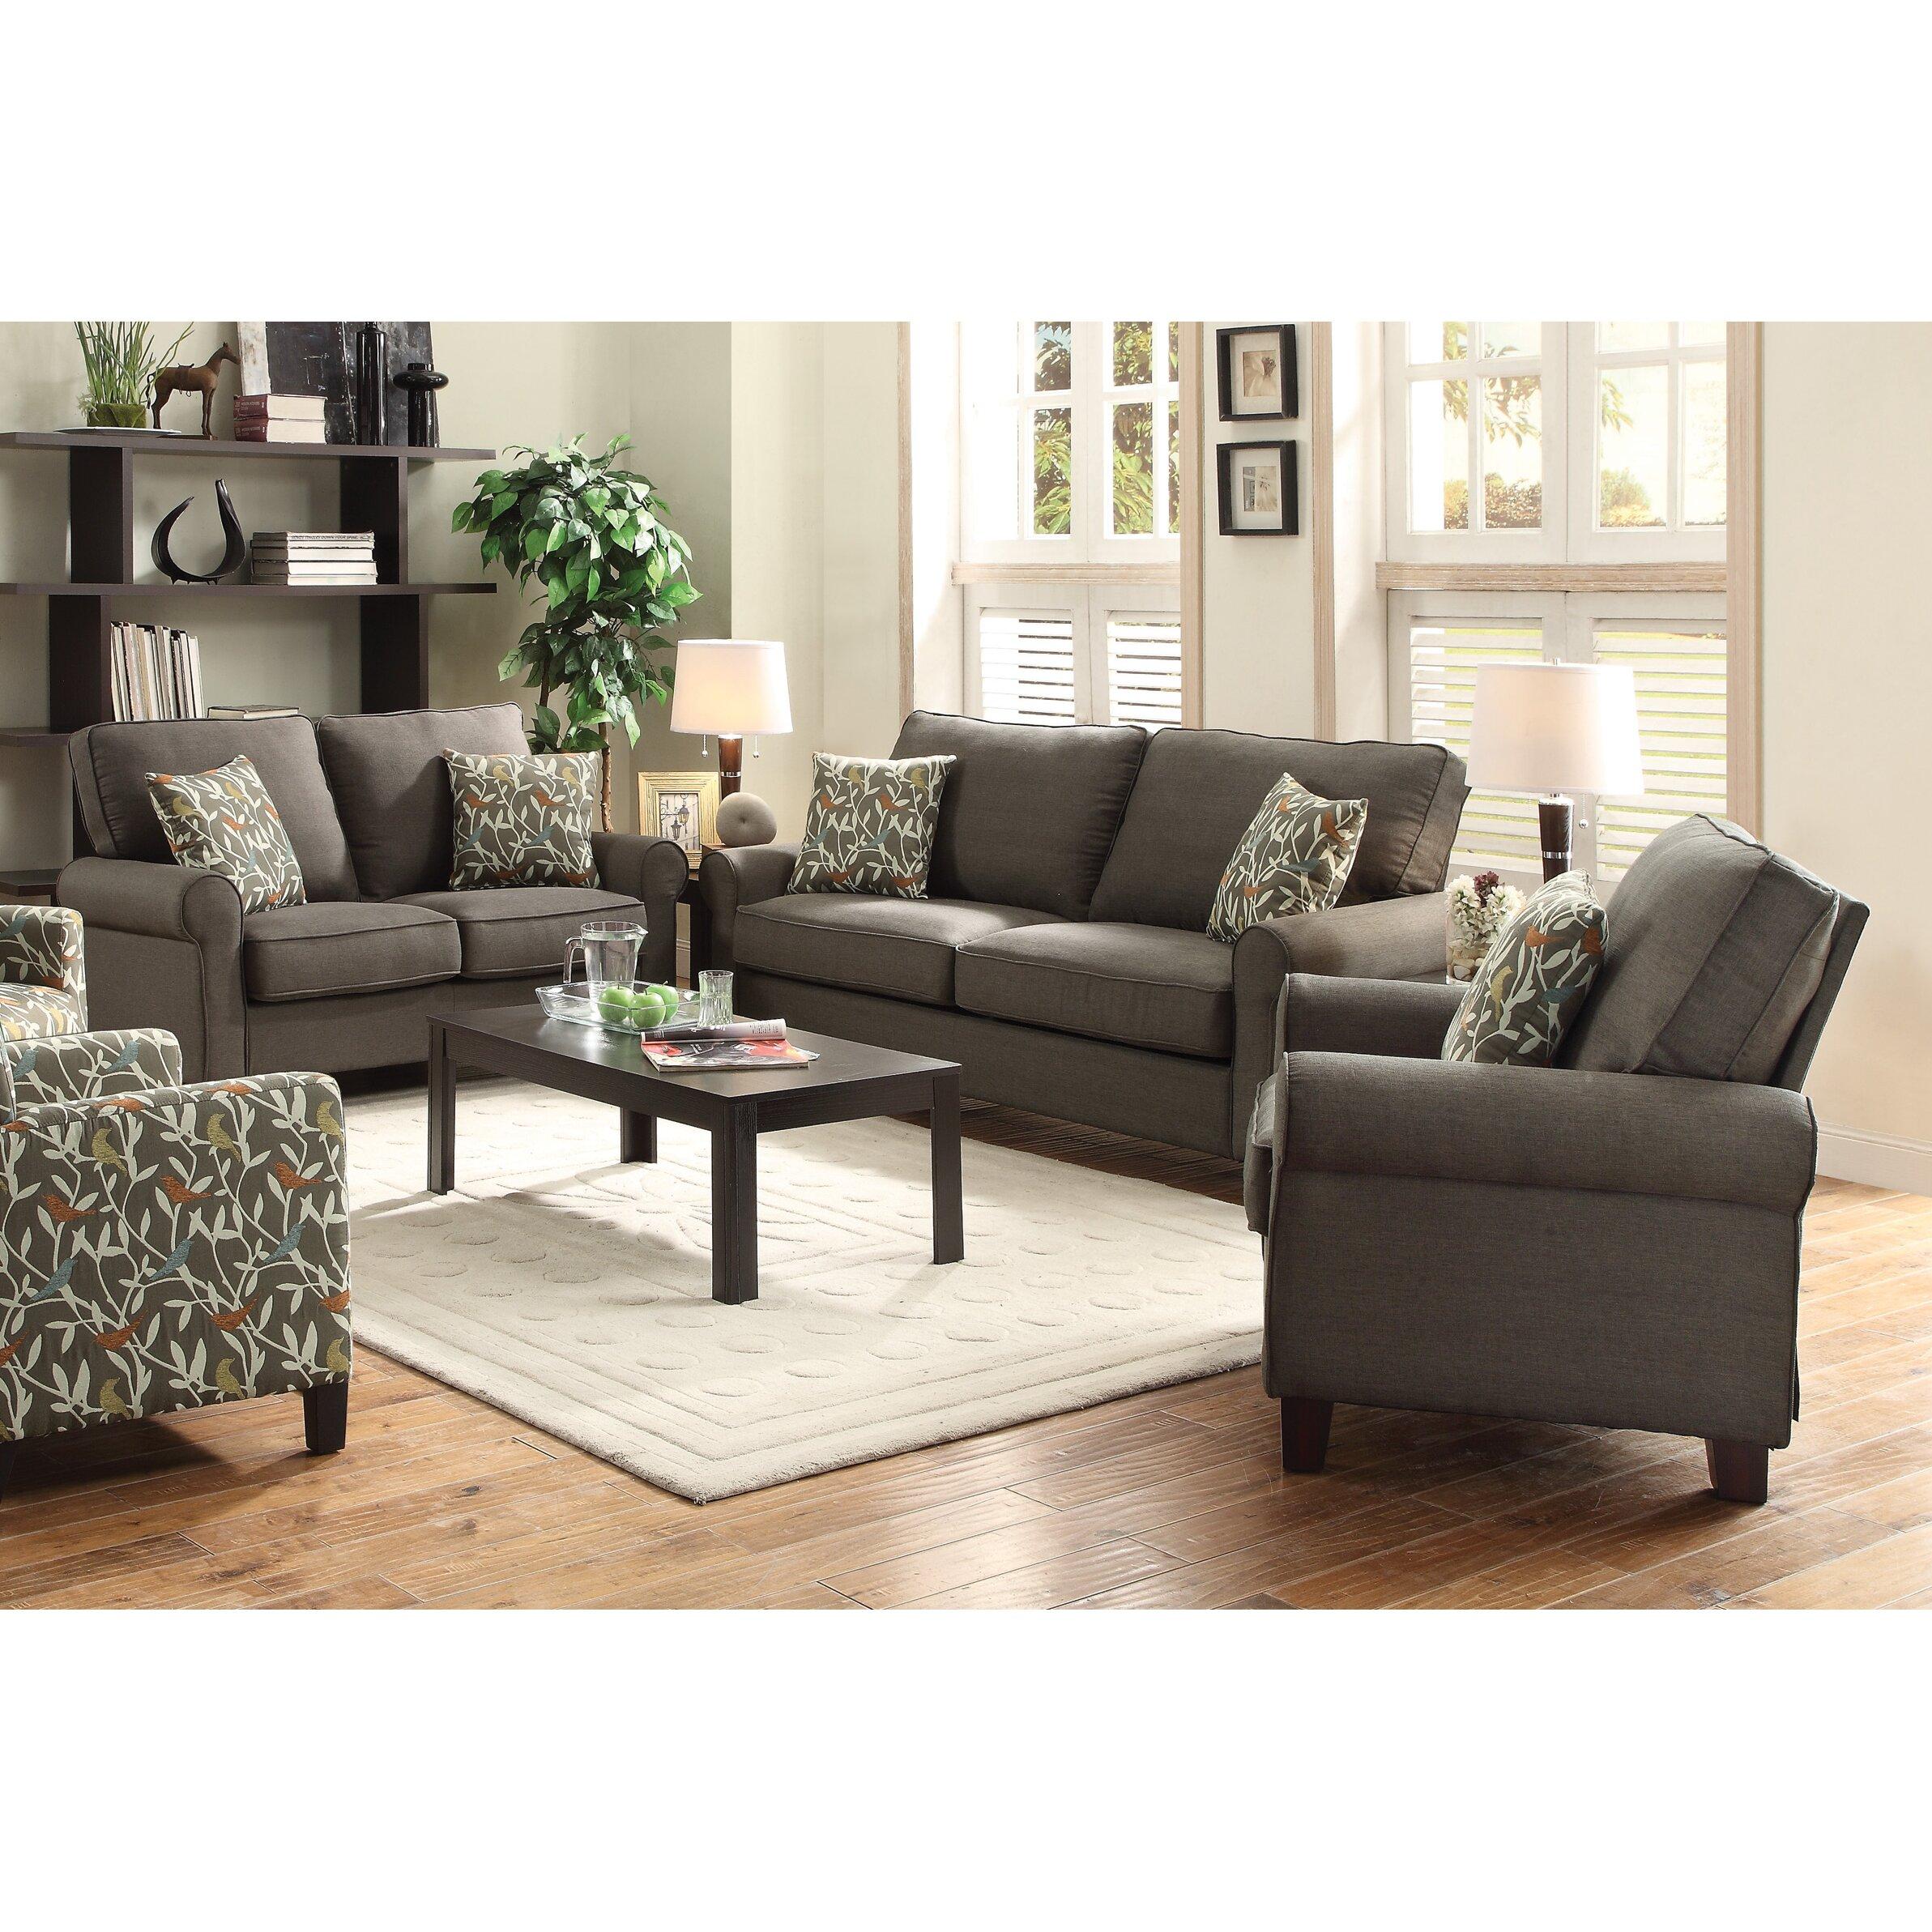 Trent Austin Design Buxton Living Room Collection Reviews Wayfair